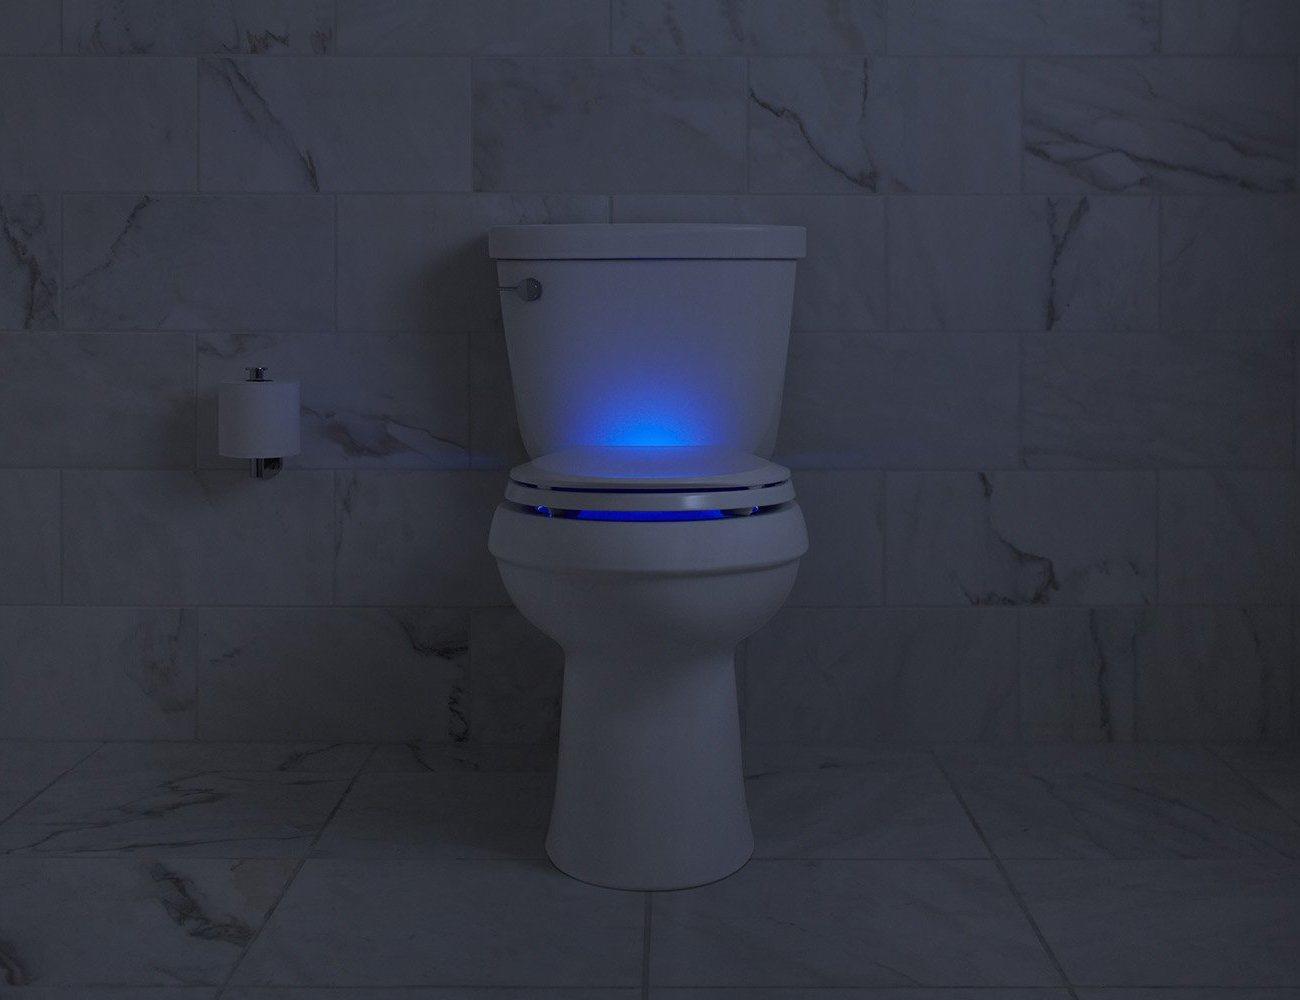 Sound Activated Nightlight Toilet Seat